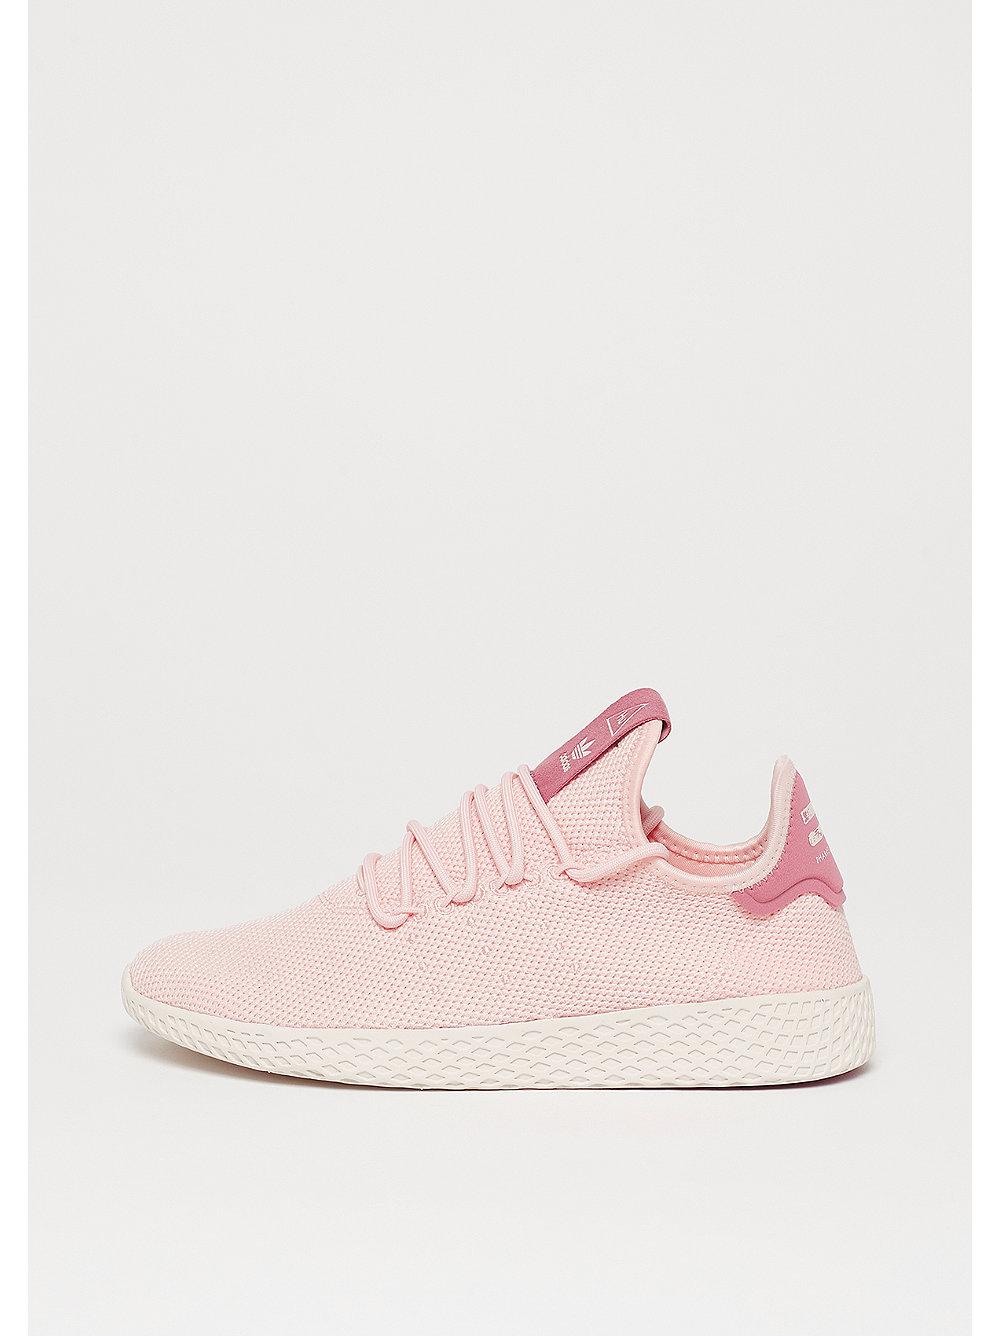 adidas Pharrell Williams Tennis HU icey pink/ic...